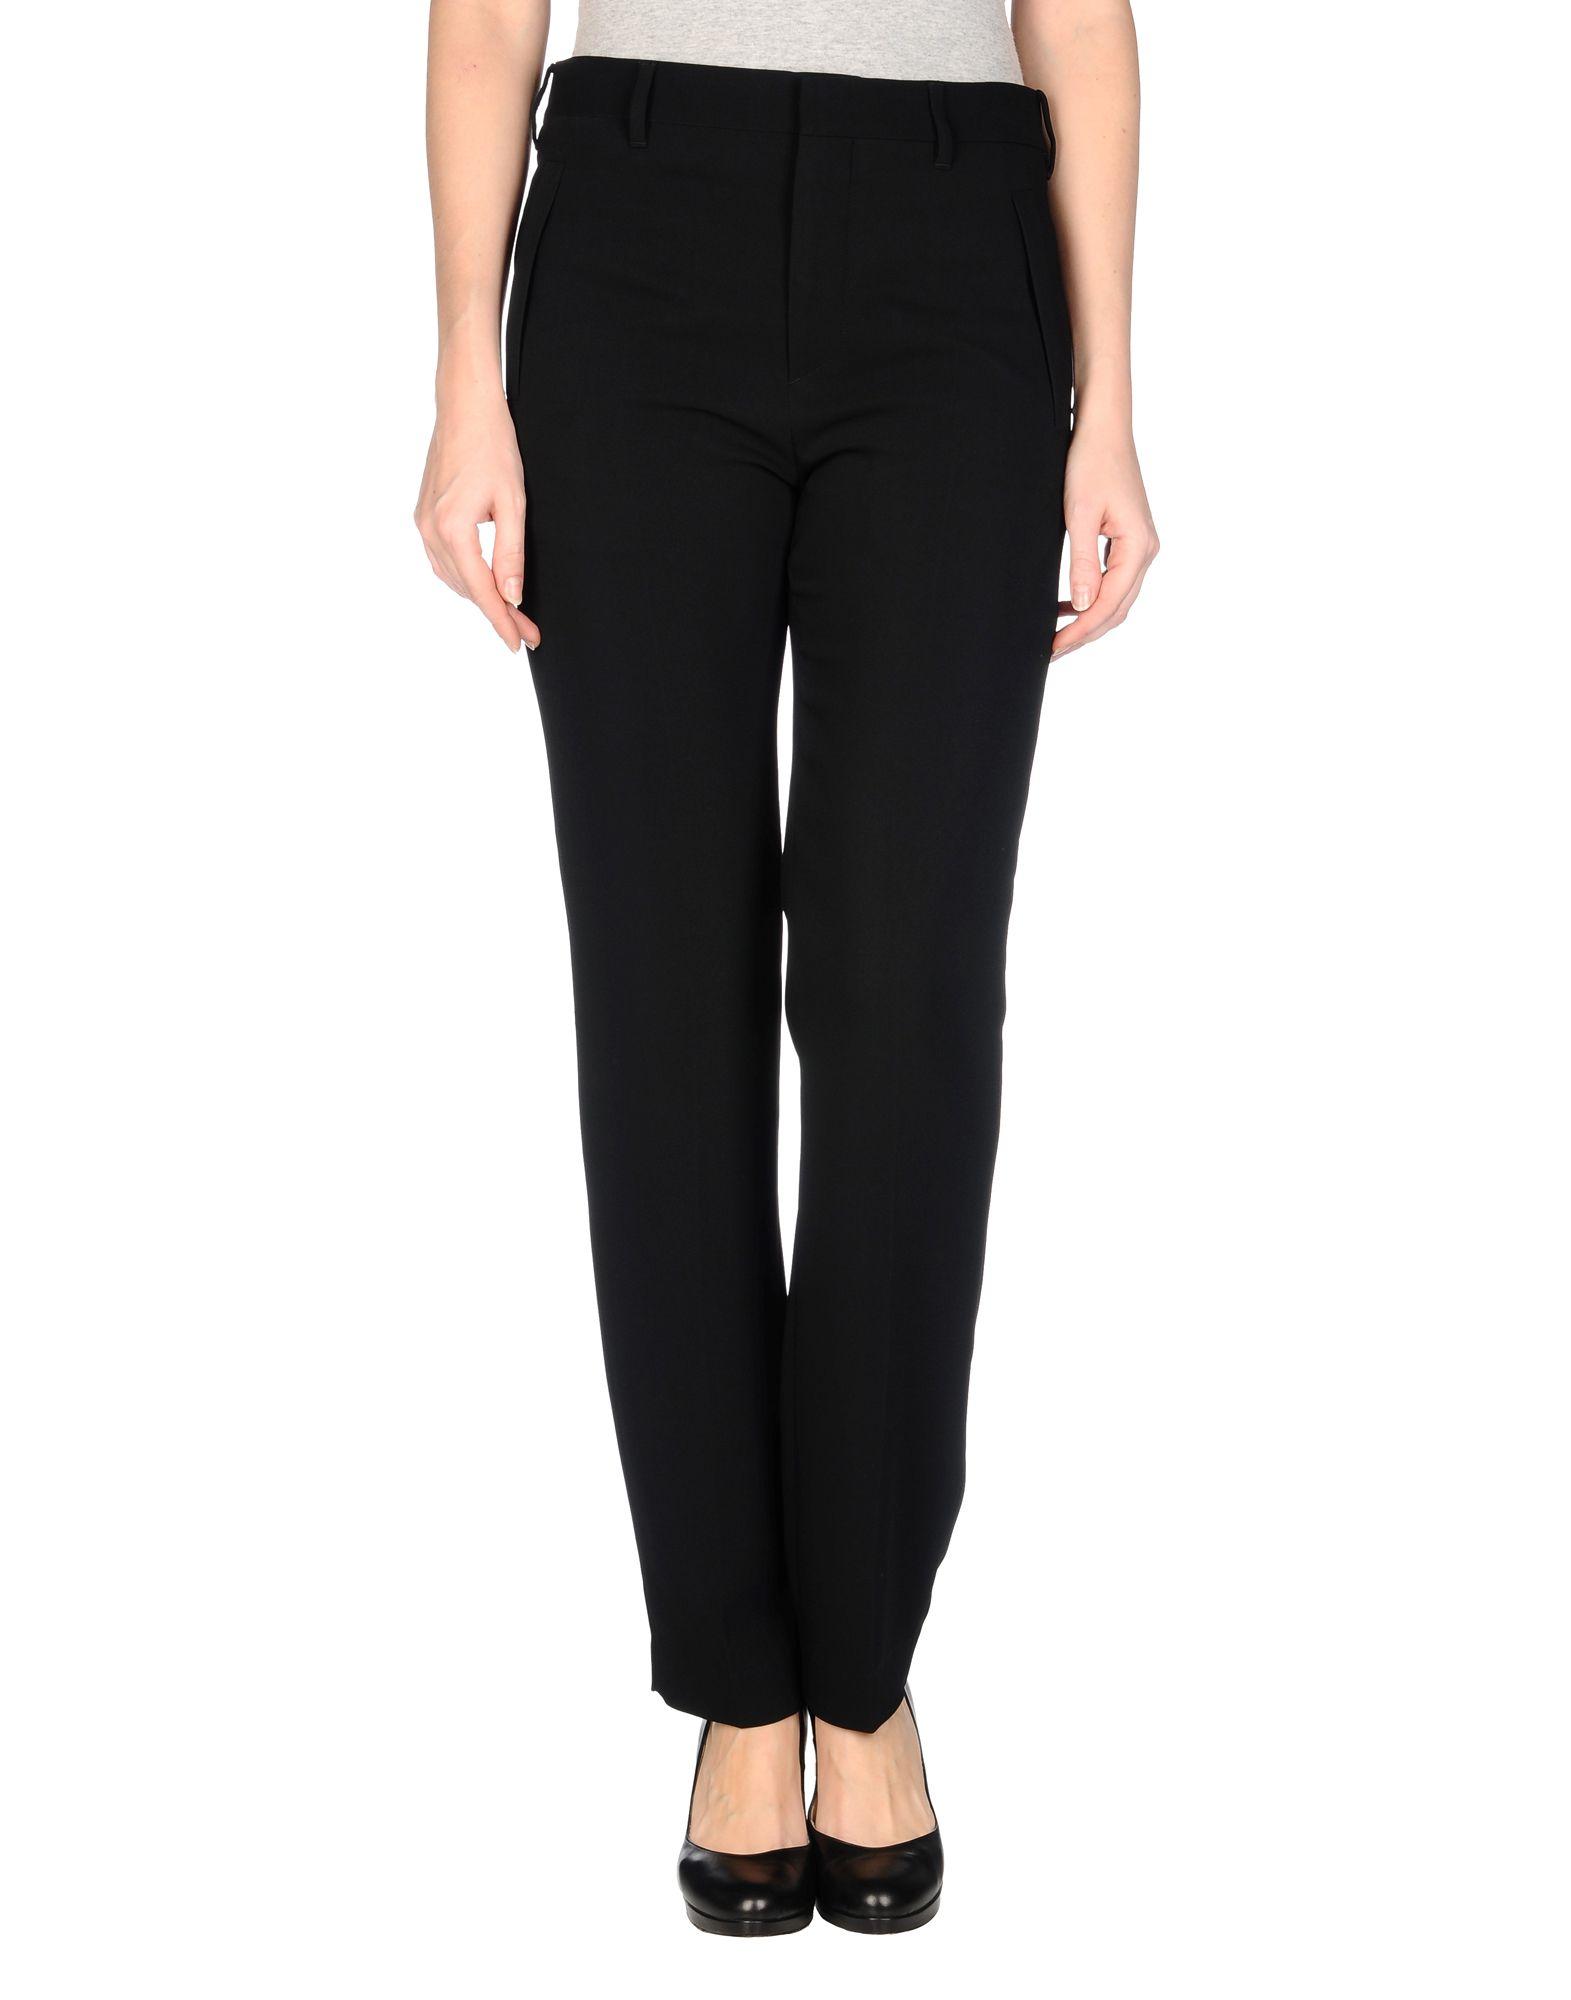 Pantalone Givenchy Donna - Acquista online su RXViMt6VtI